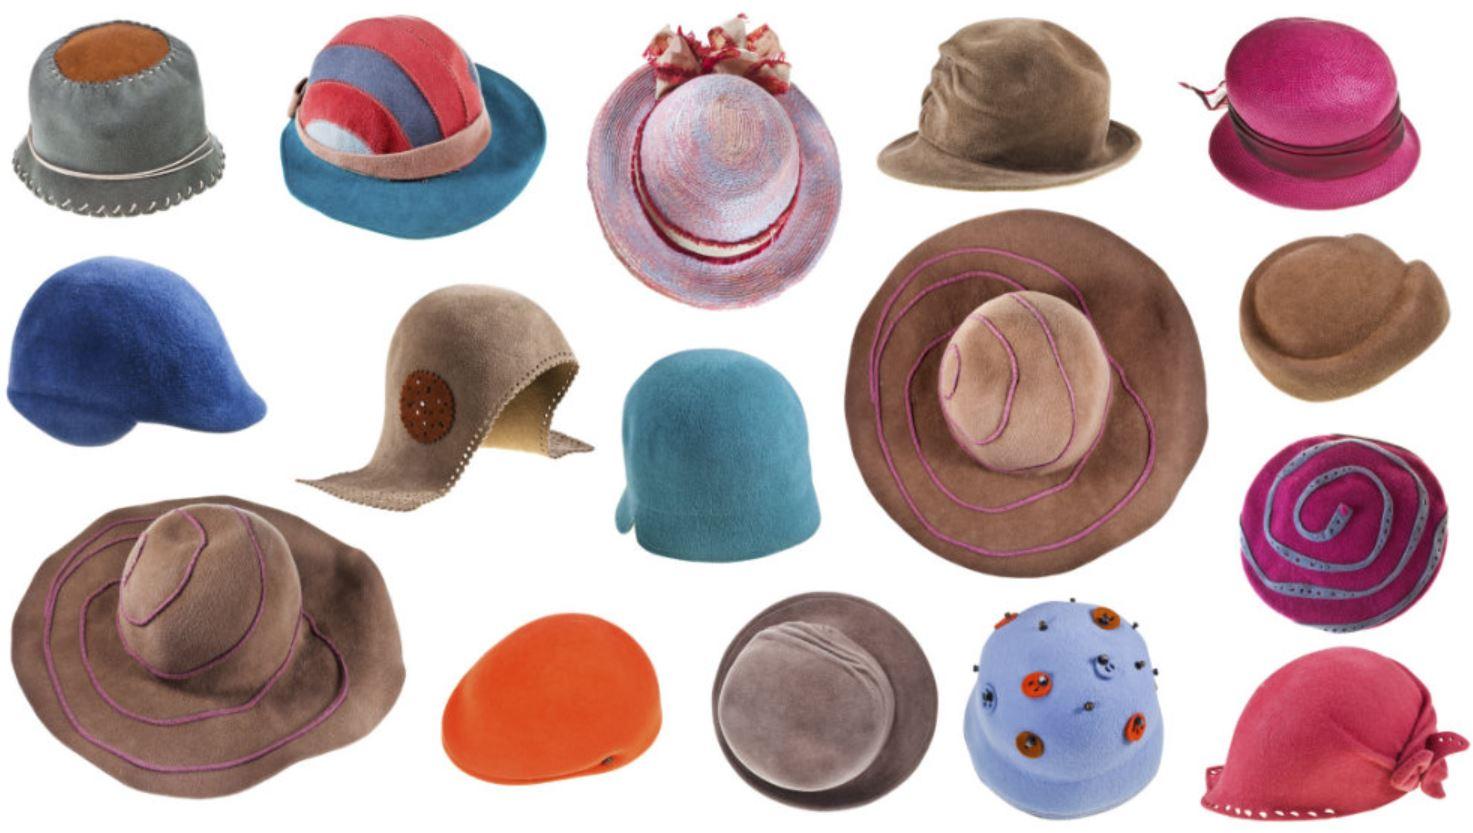 c5dfc9e35577f ▷ Los mejores sombreros del momento